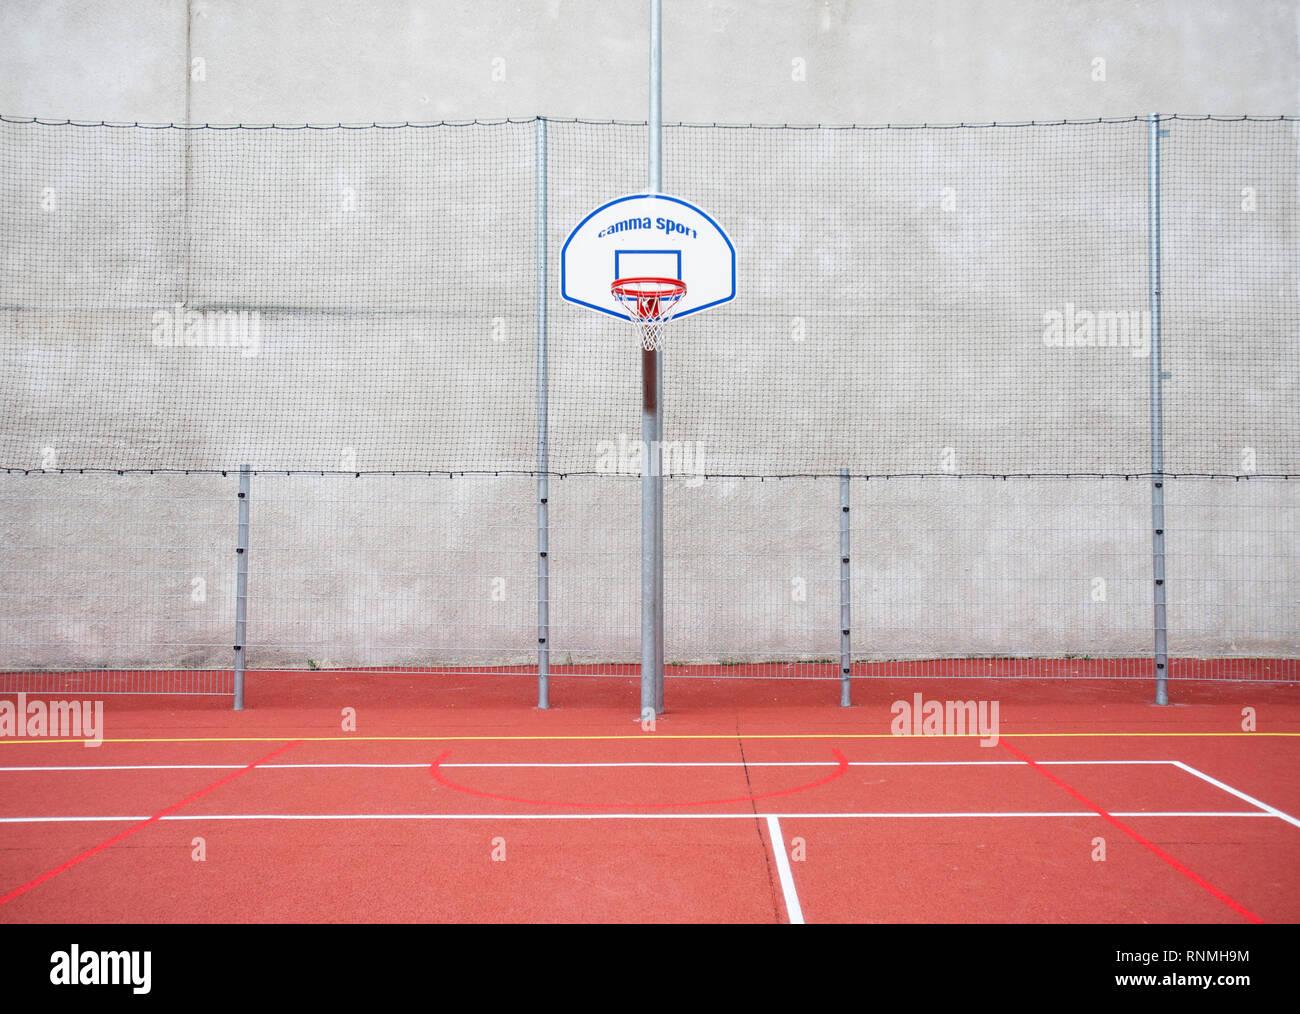 Terrain de Jeu: panneau de basket-ball Photo Stock